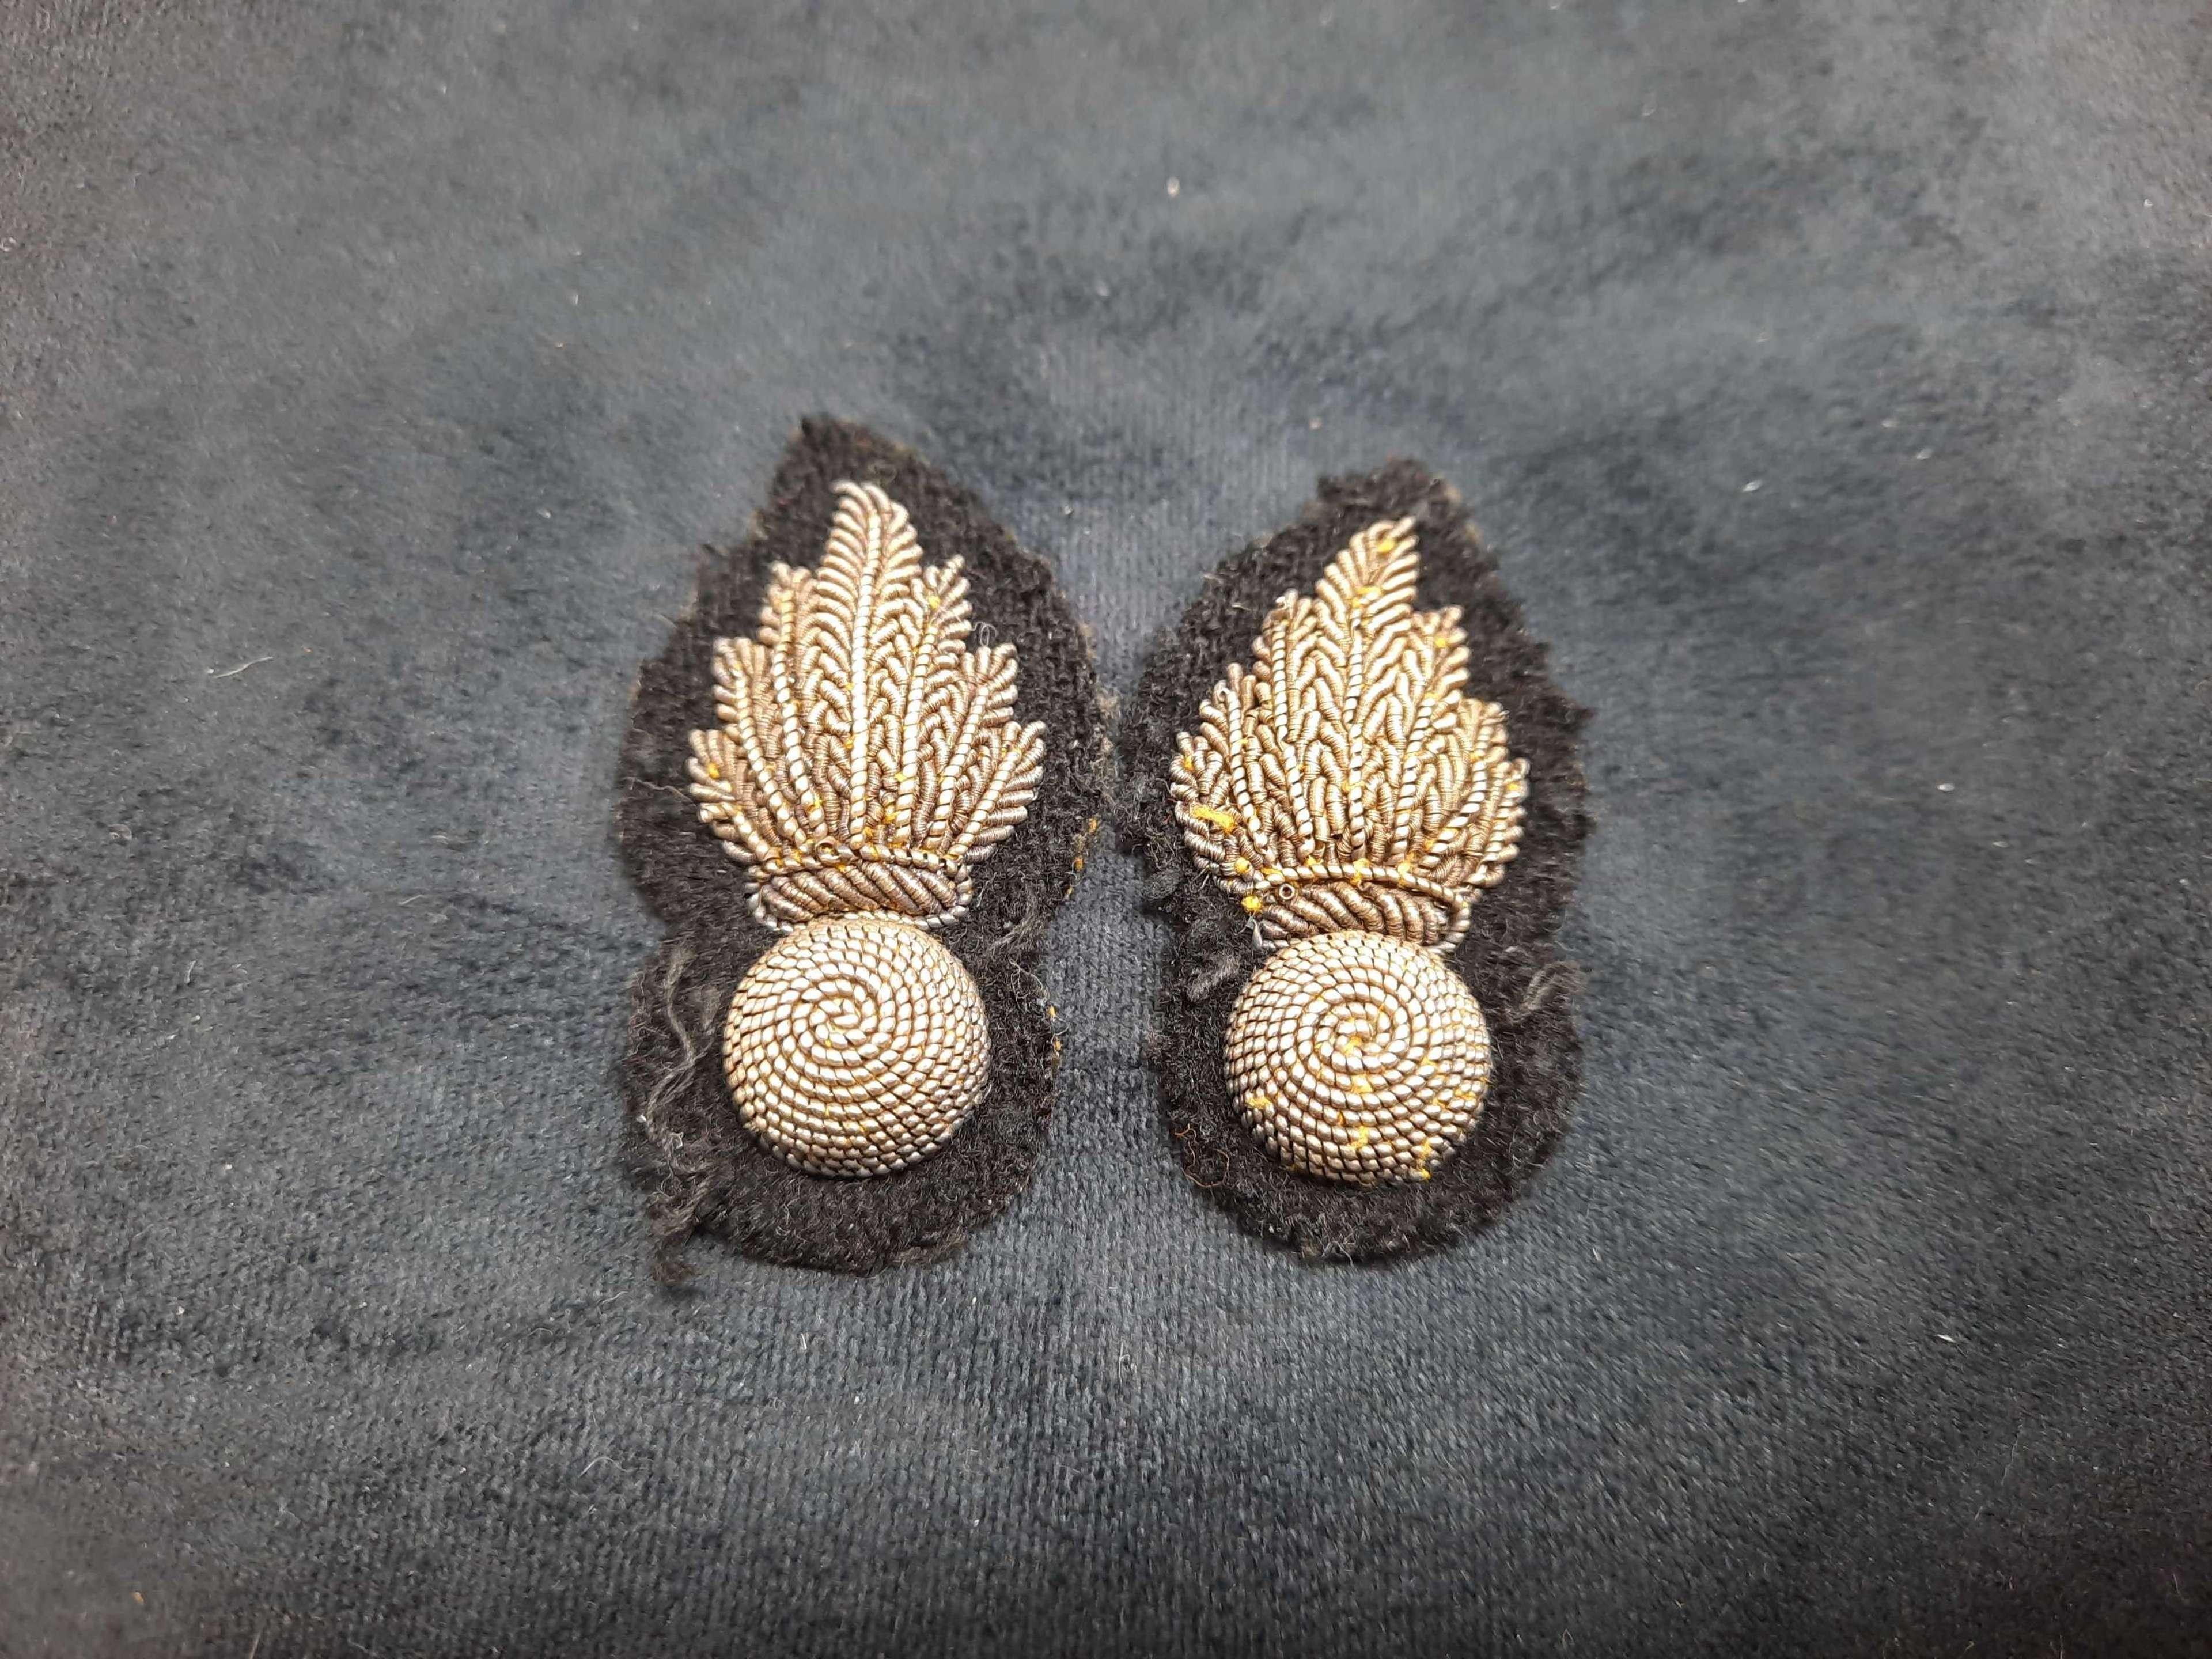 Royal Artillery Mess Dress Insignia